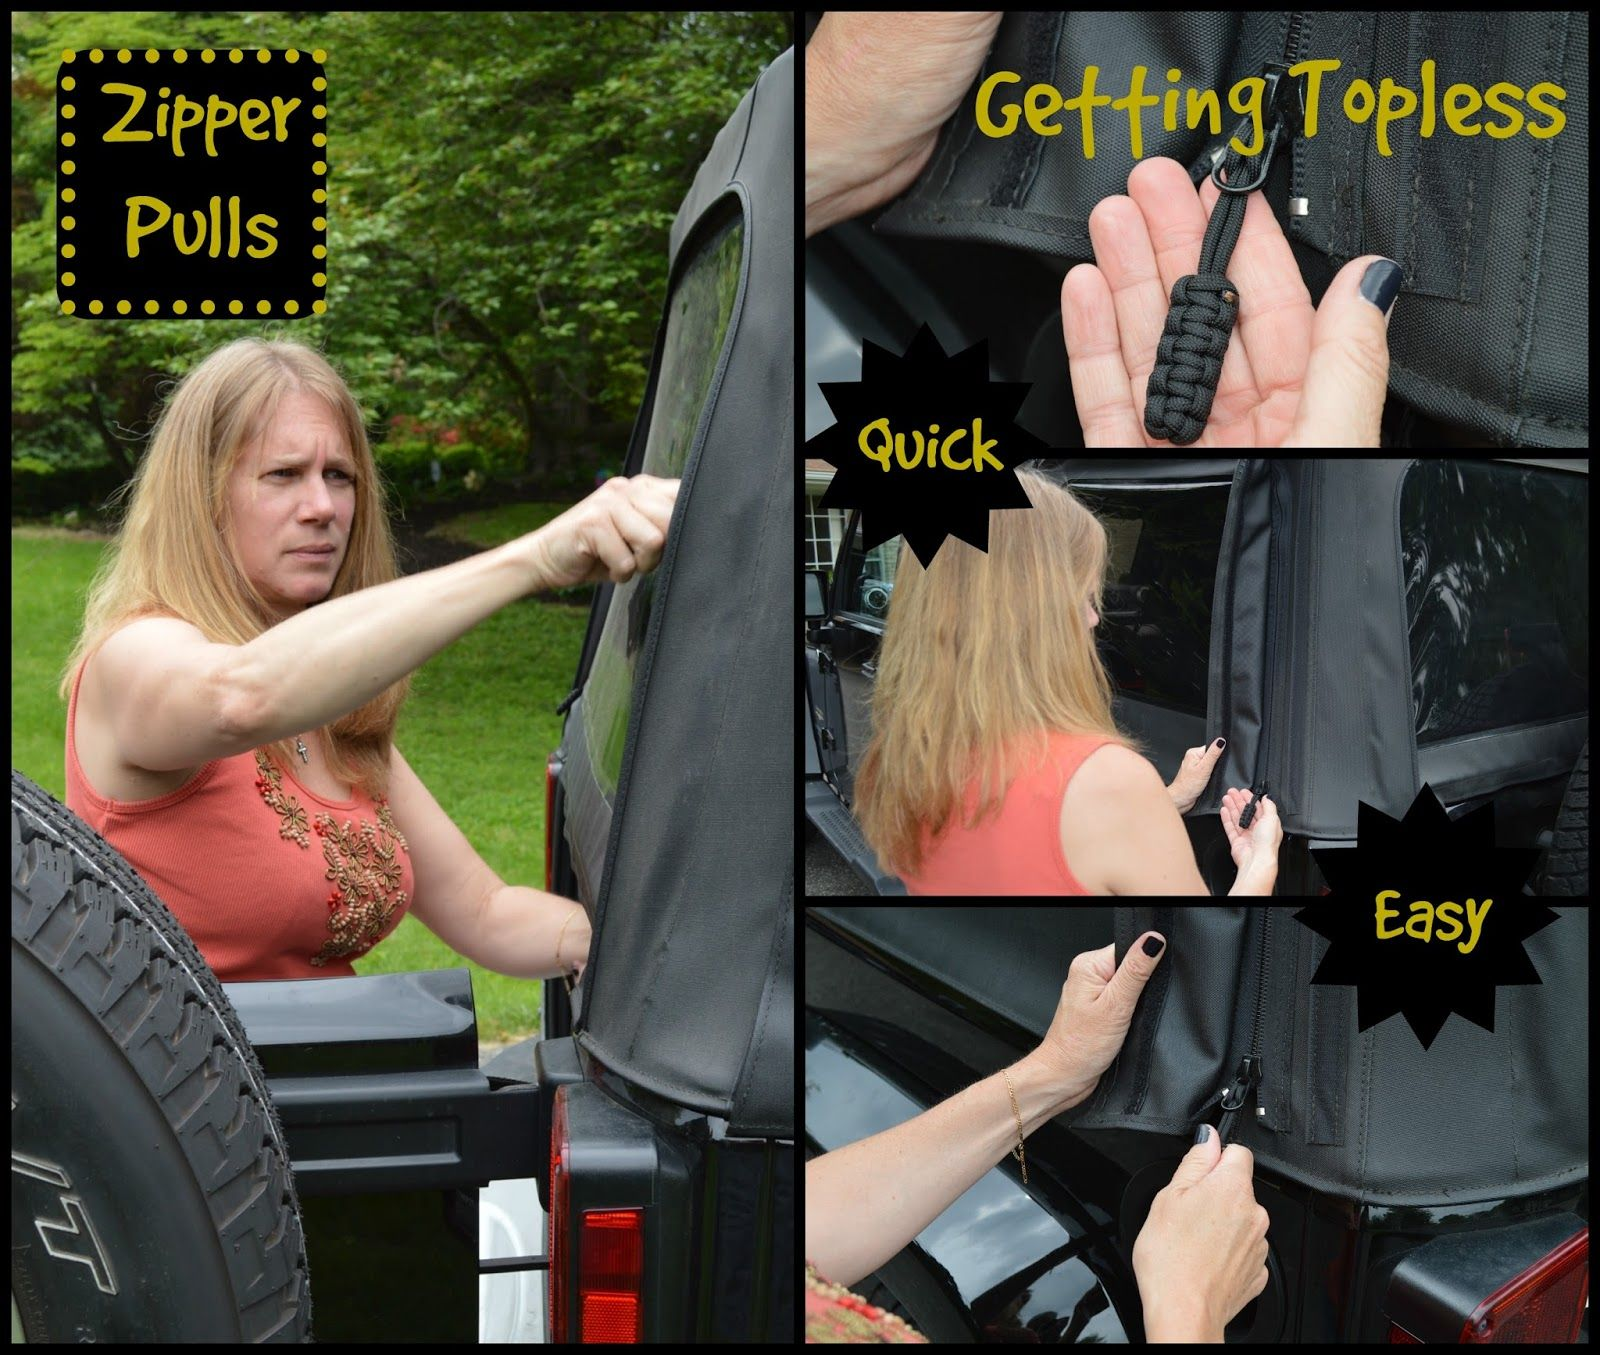 Zipper Pulls Jeep Wrangler Jeep Wrangler Soft Top Soft Tops